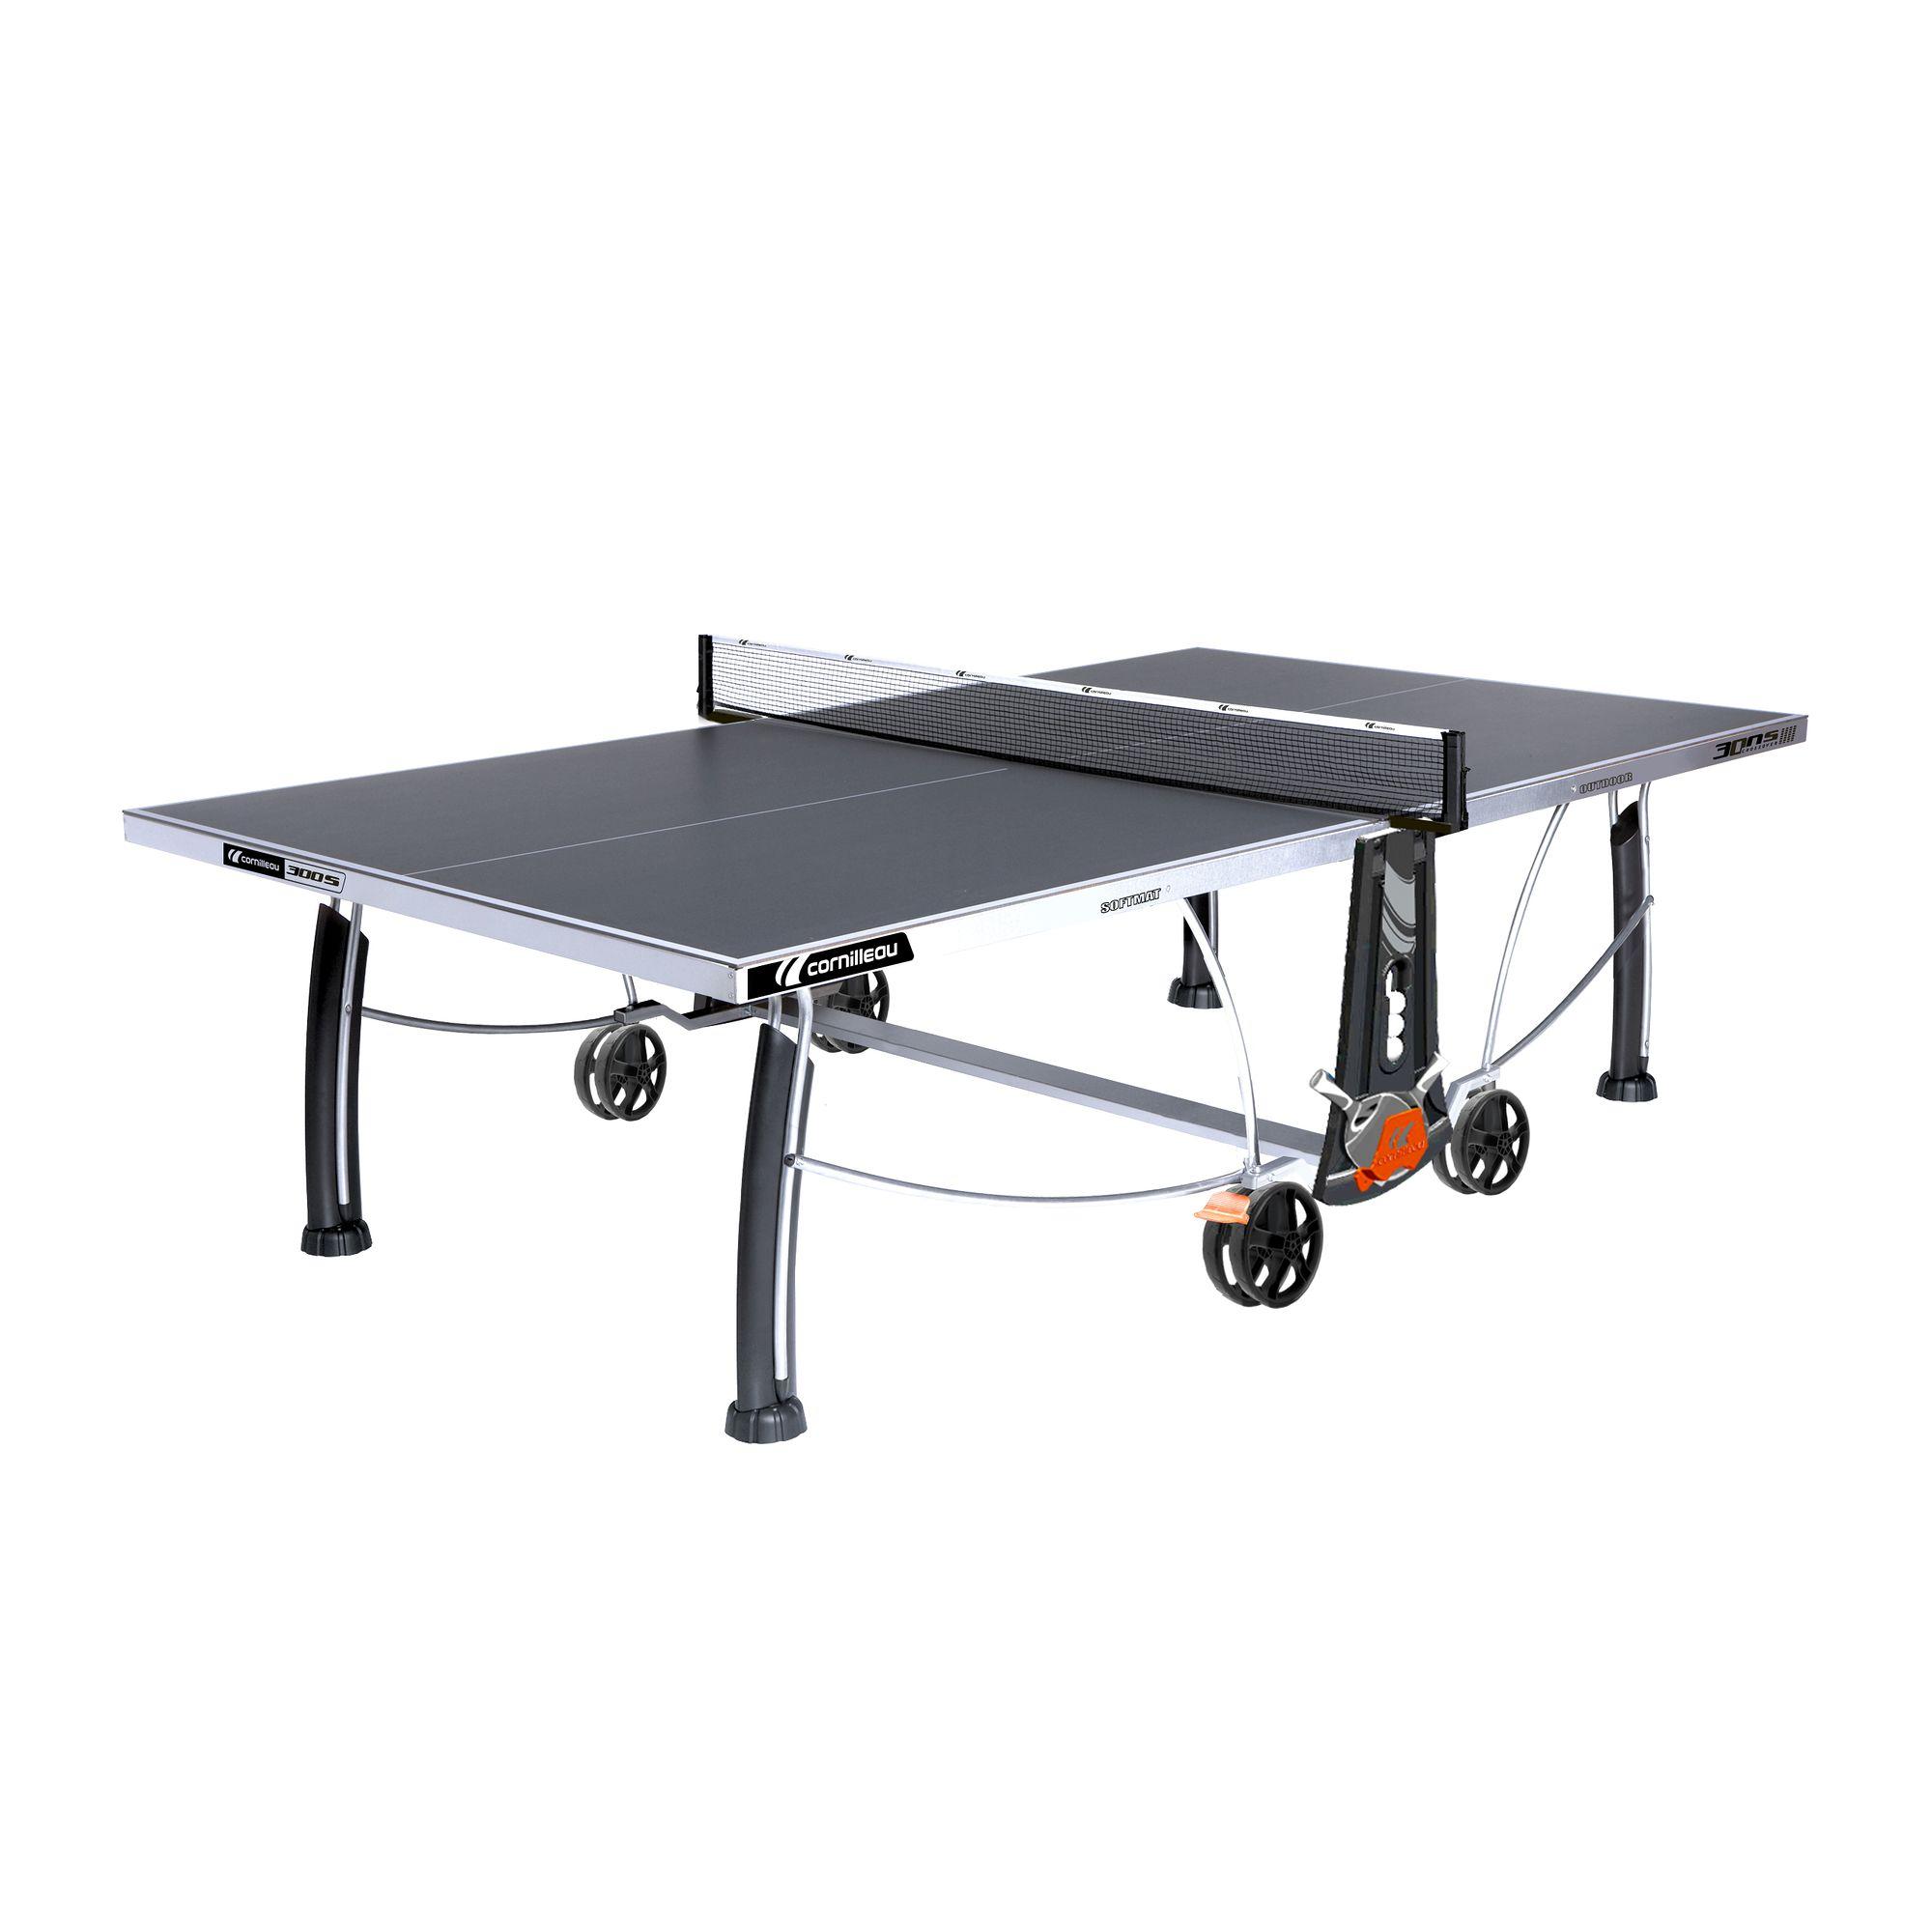 TABLE DE TENNIS DE TABLE CORNILLEAU CROSSOVER 300S GRIS